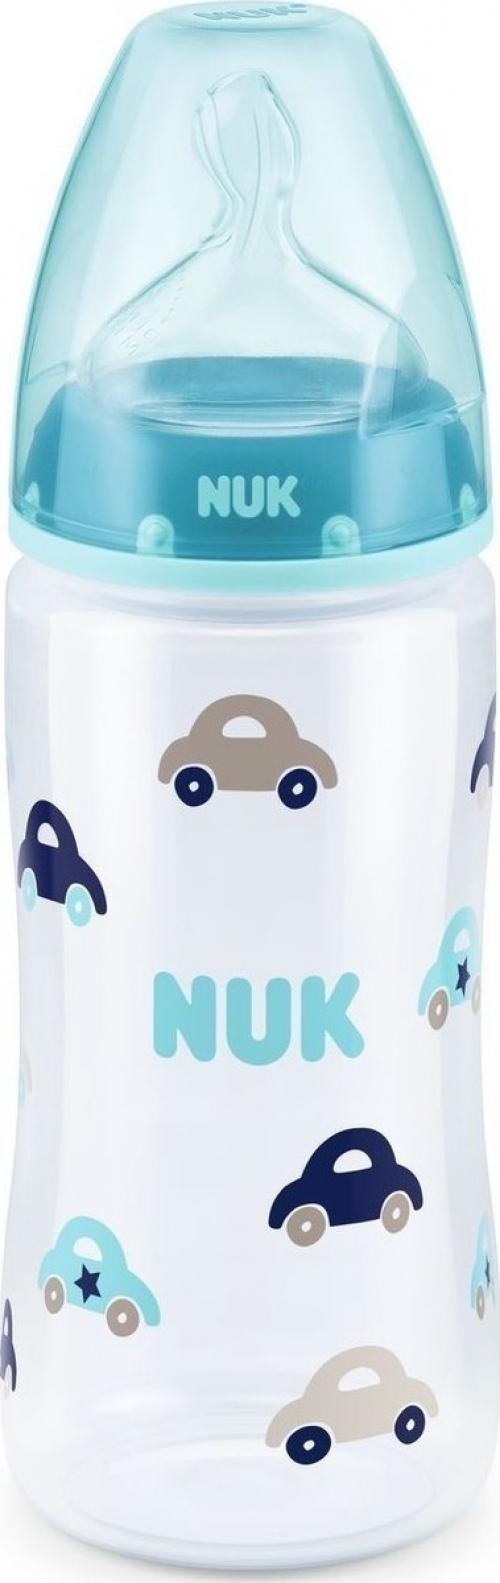 Nuk First Choice+ Μπιμπερό Πολυπροπυλενίου (PP) Πιπίλα Σιλικόνη Μπλε Αυτοκινητάκι 300ml